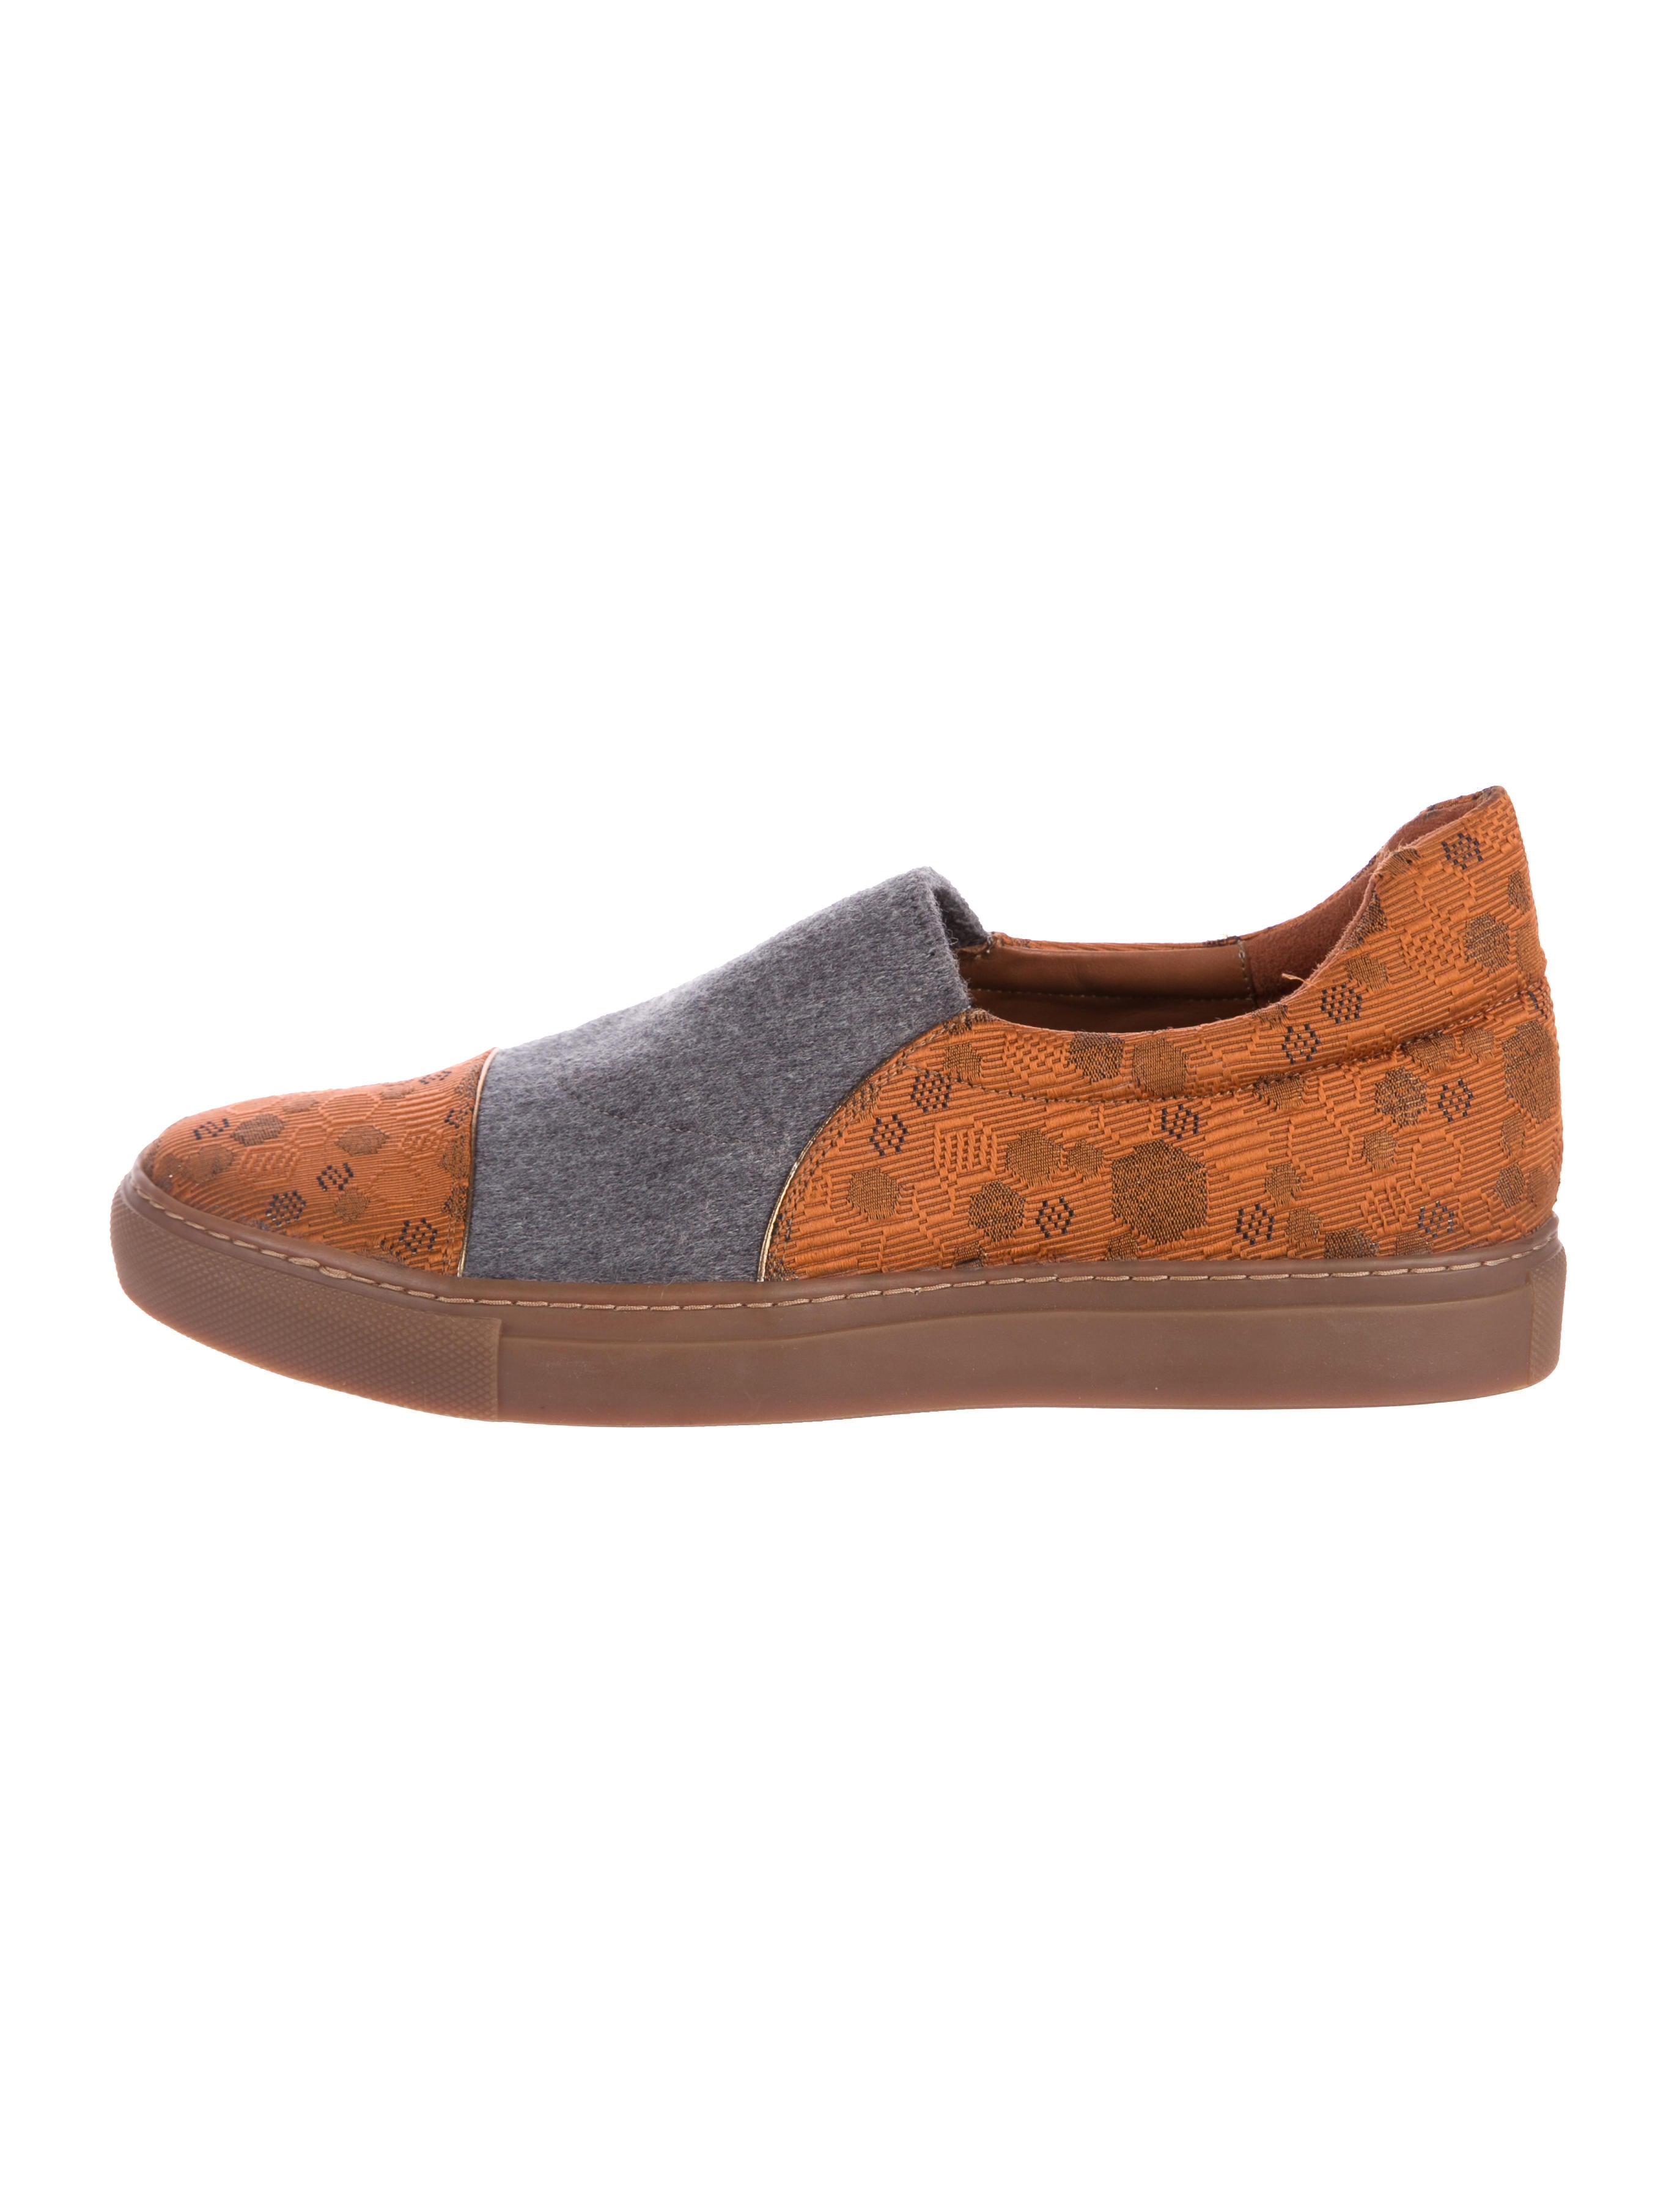 sale amazing price Dries Van Noten Woven Jacquard Slip-On Sneakers cheap sale finishline Qxwwq